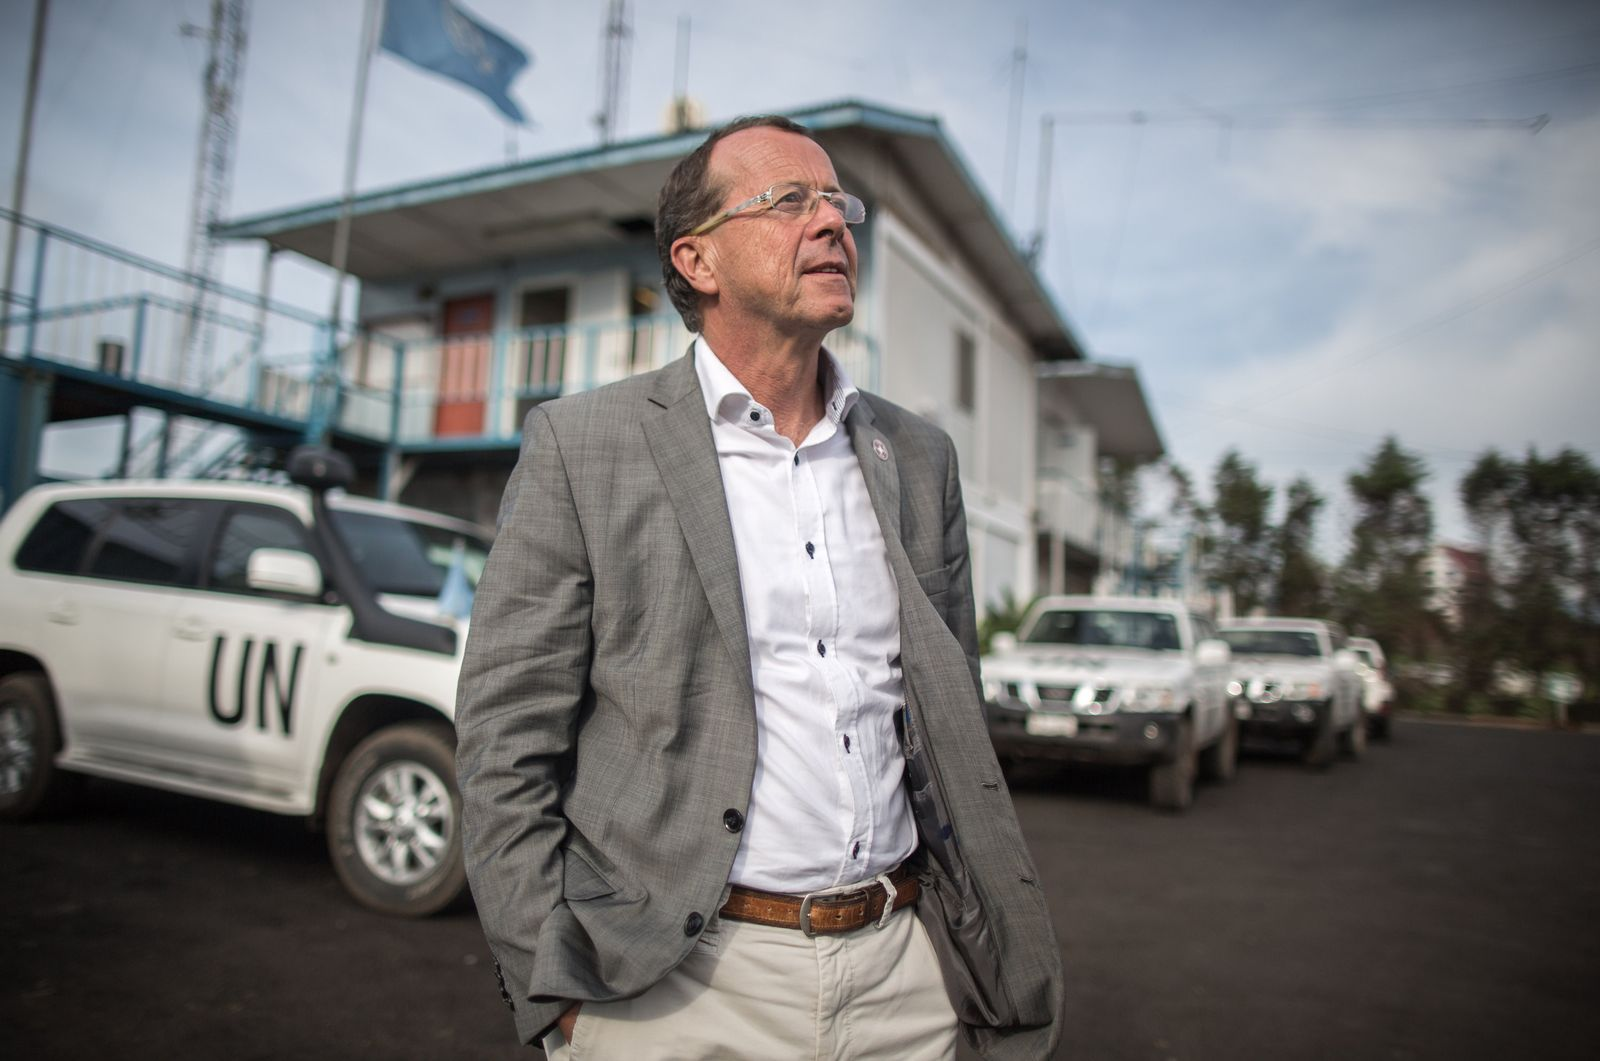 Martin Kobler UN Mission